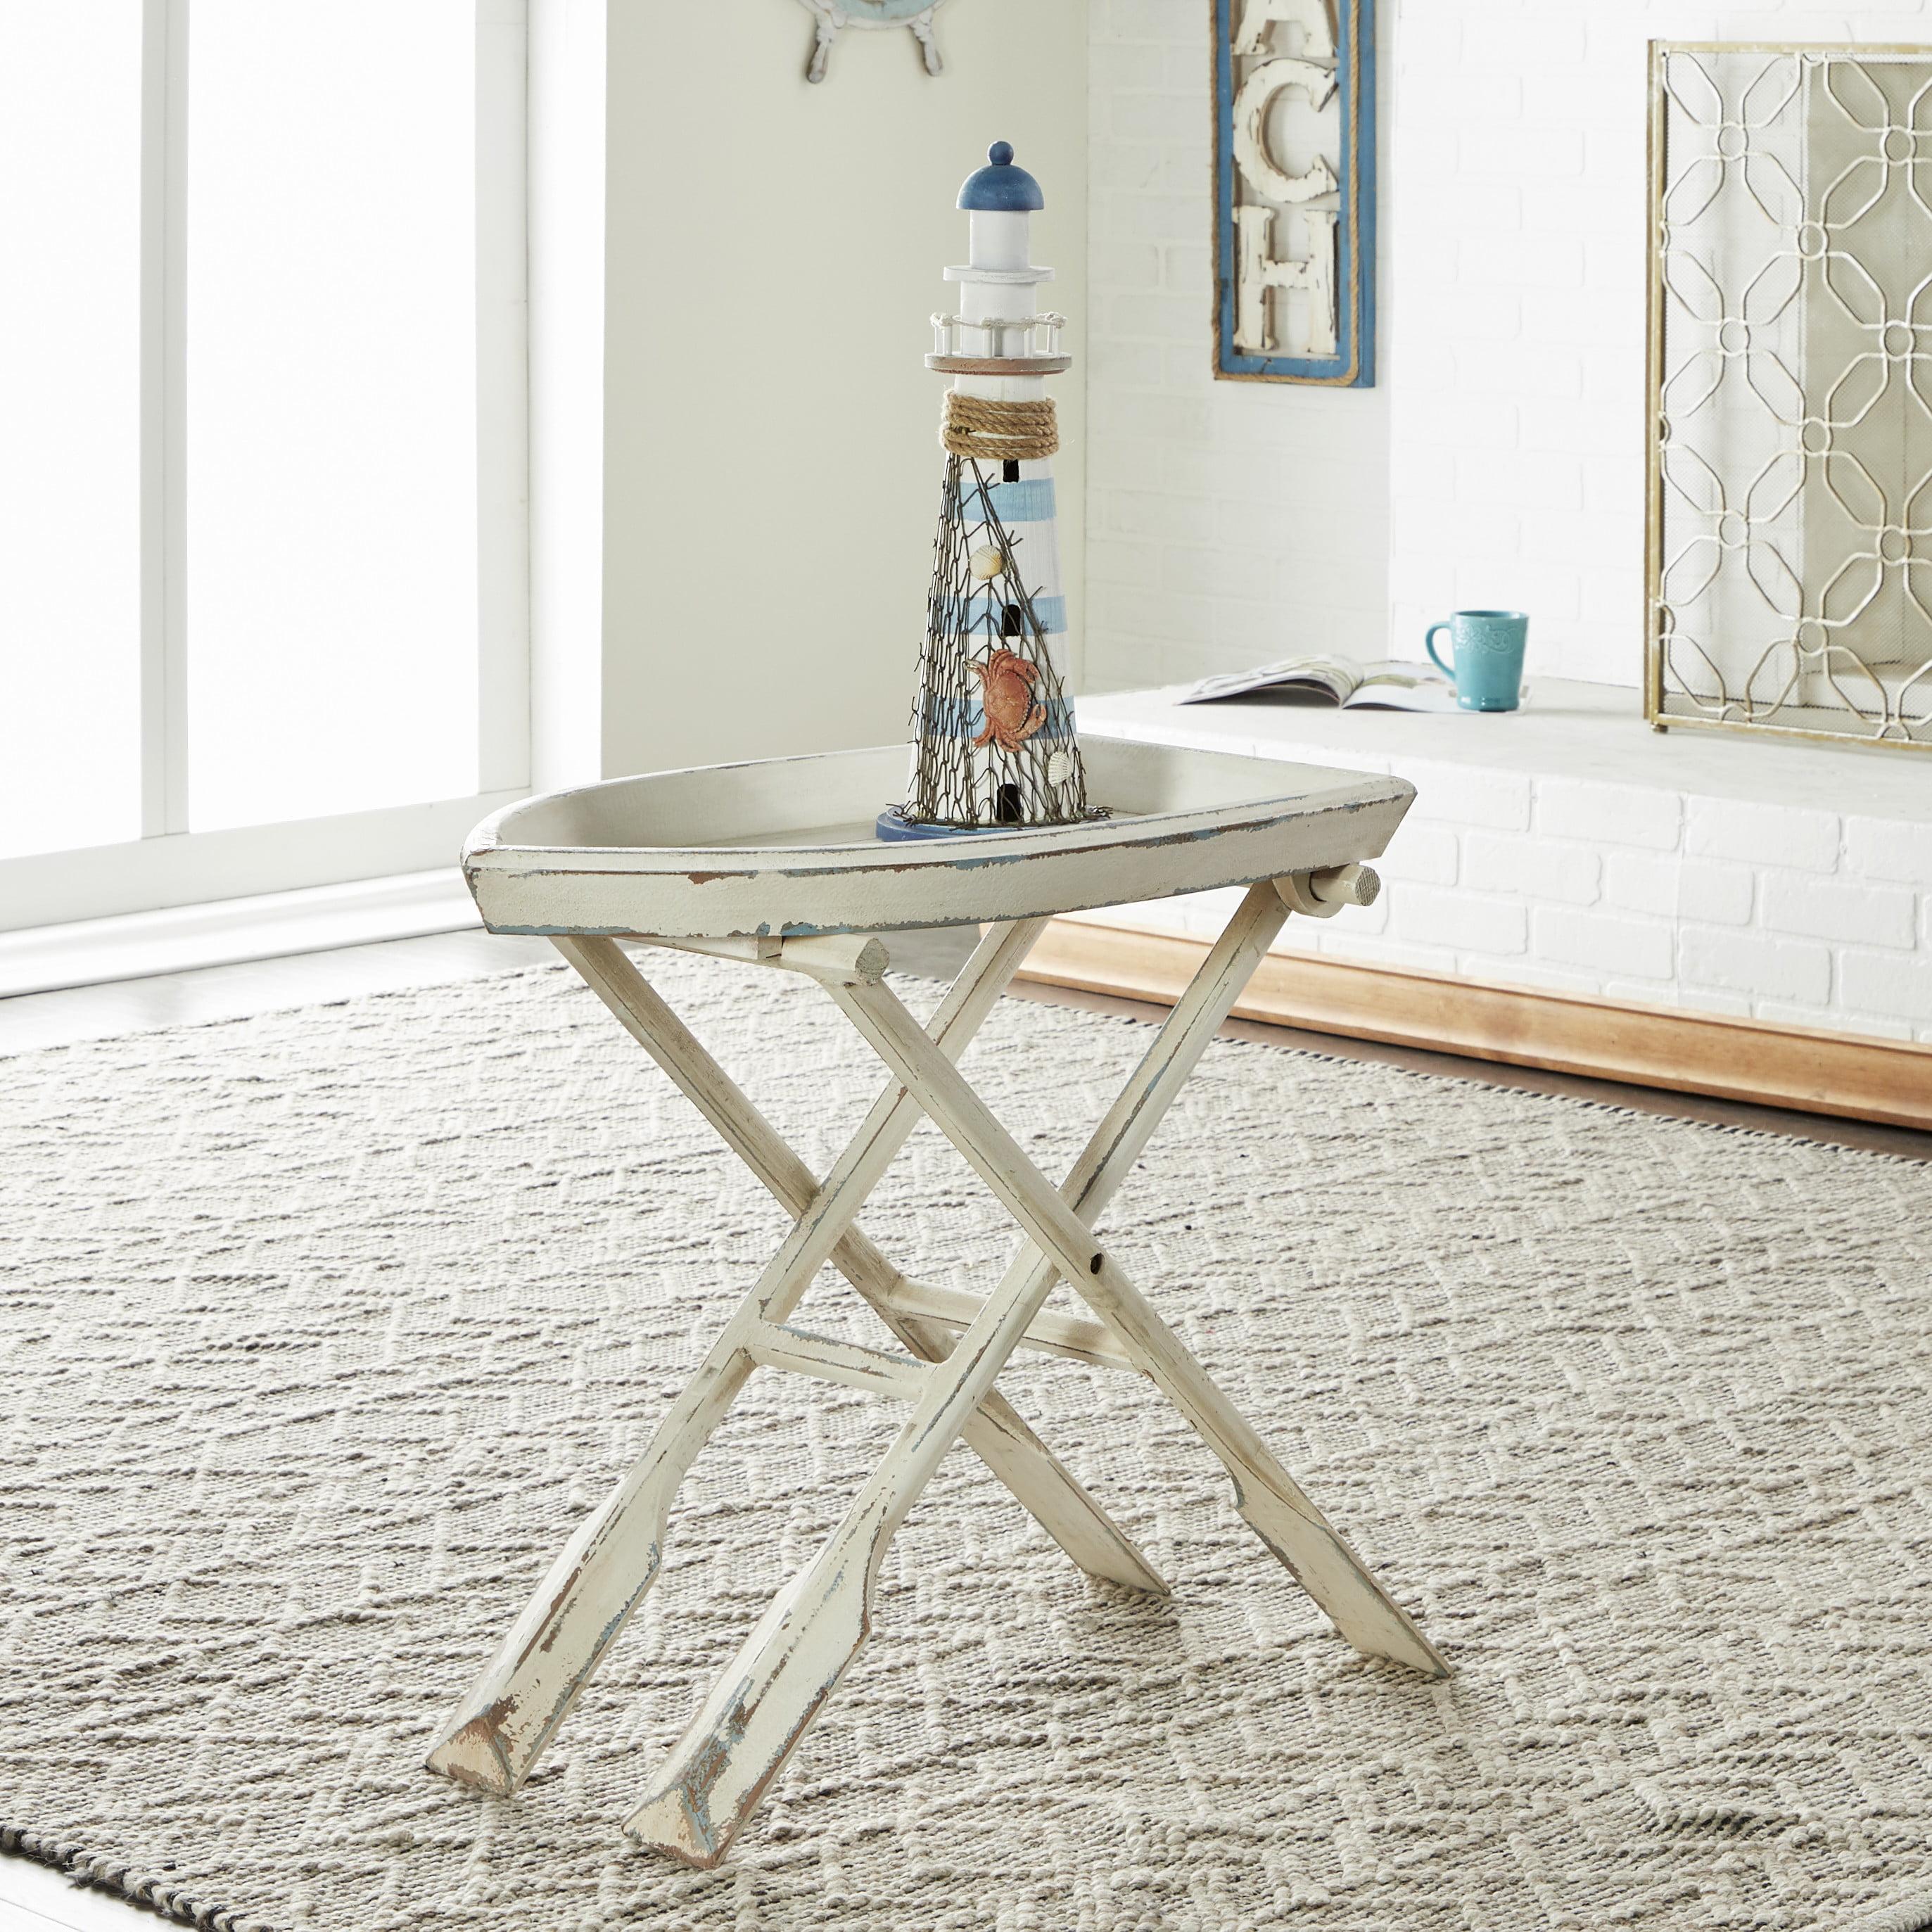 - Decmode - Coastal Decor Distressed White Wood Accent Table, White